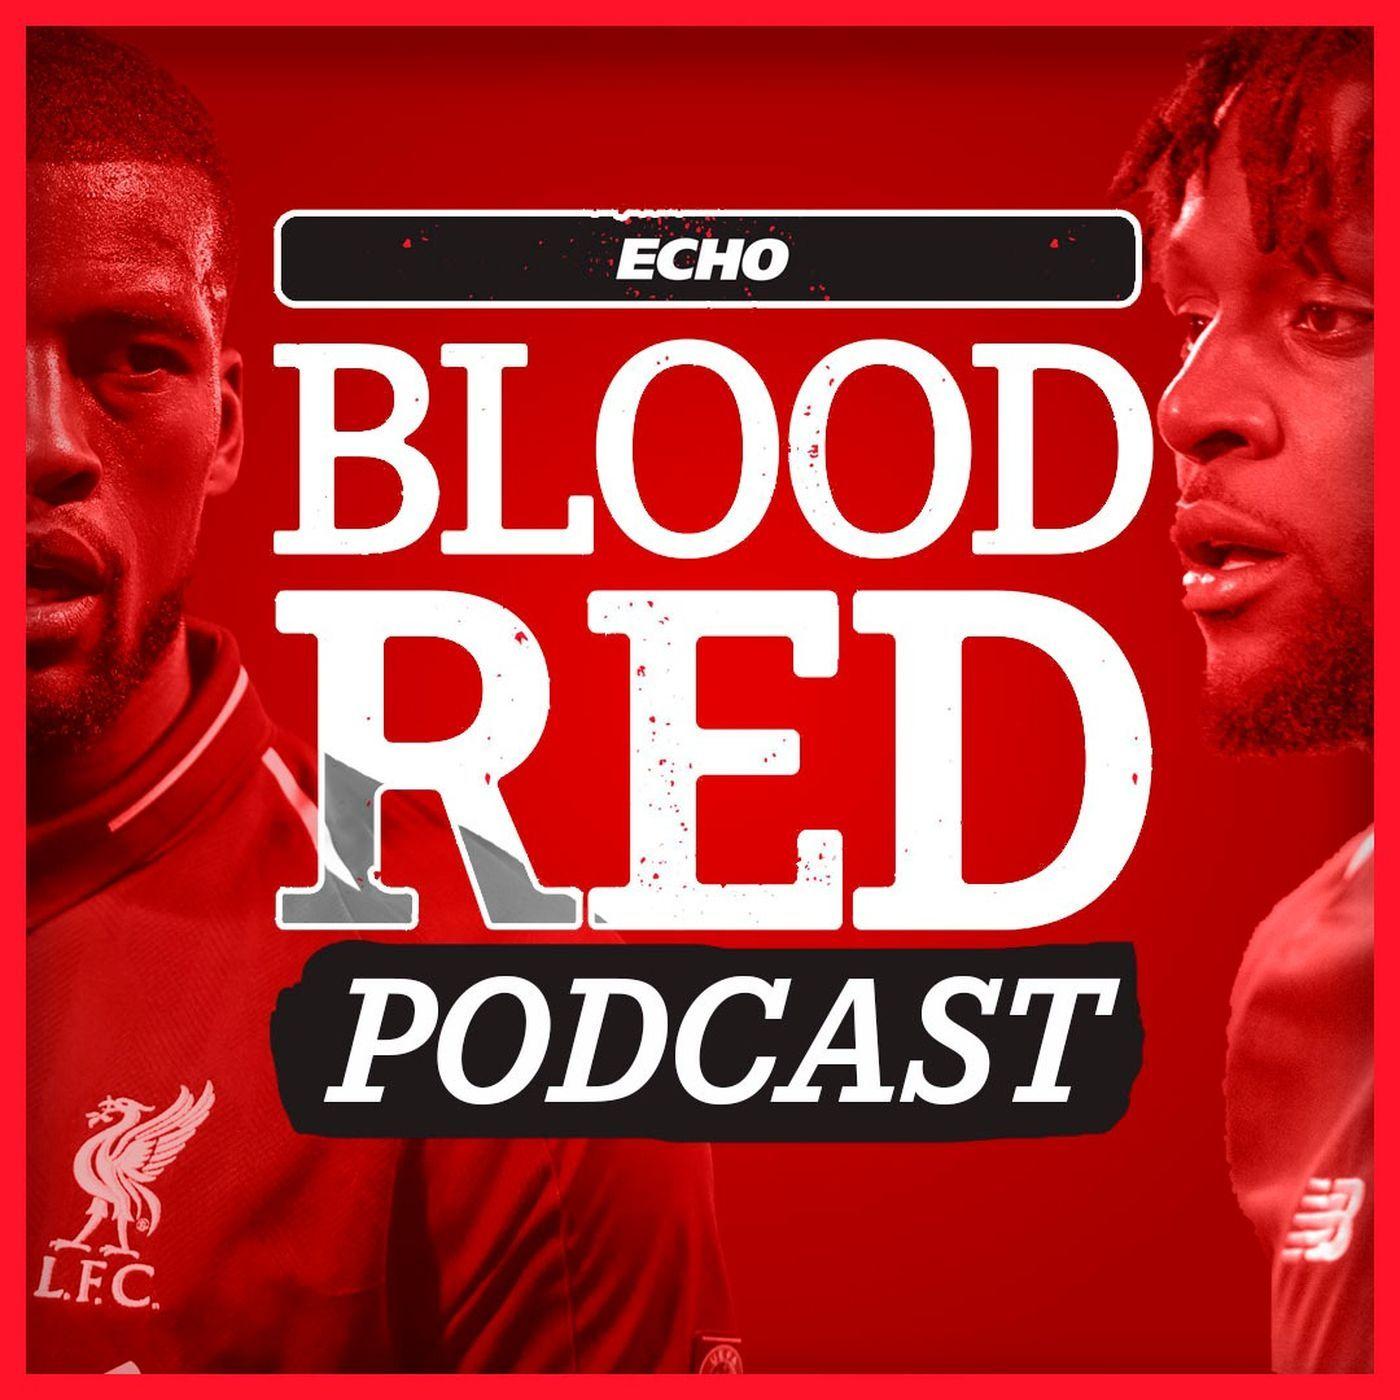 Blood Red: What next for Liverpool's Barcelona heroes? | Wijnaldum, Origi, Shaqiri